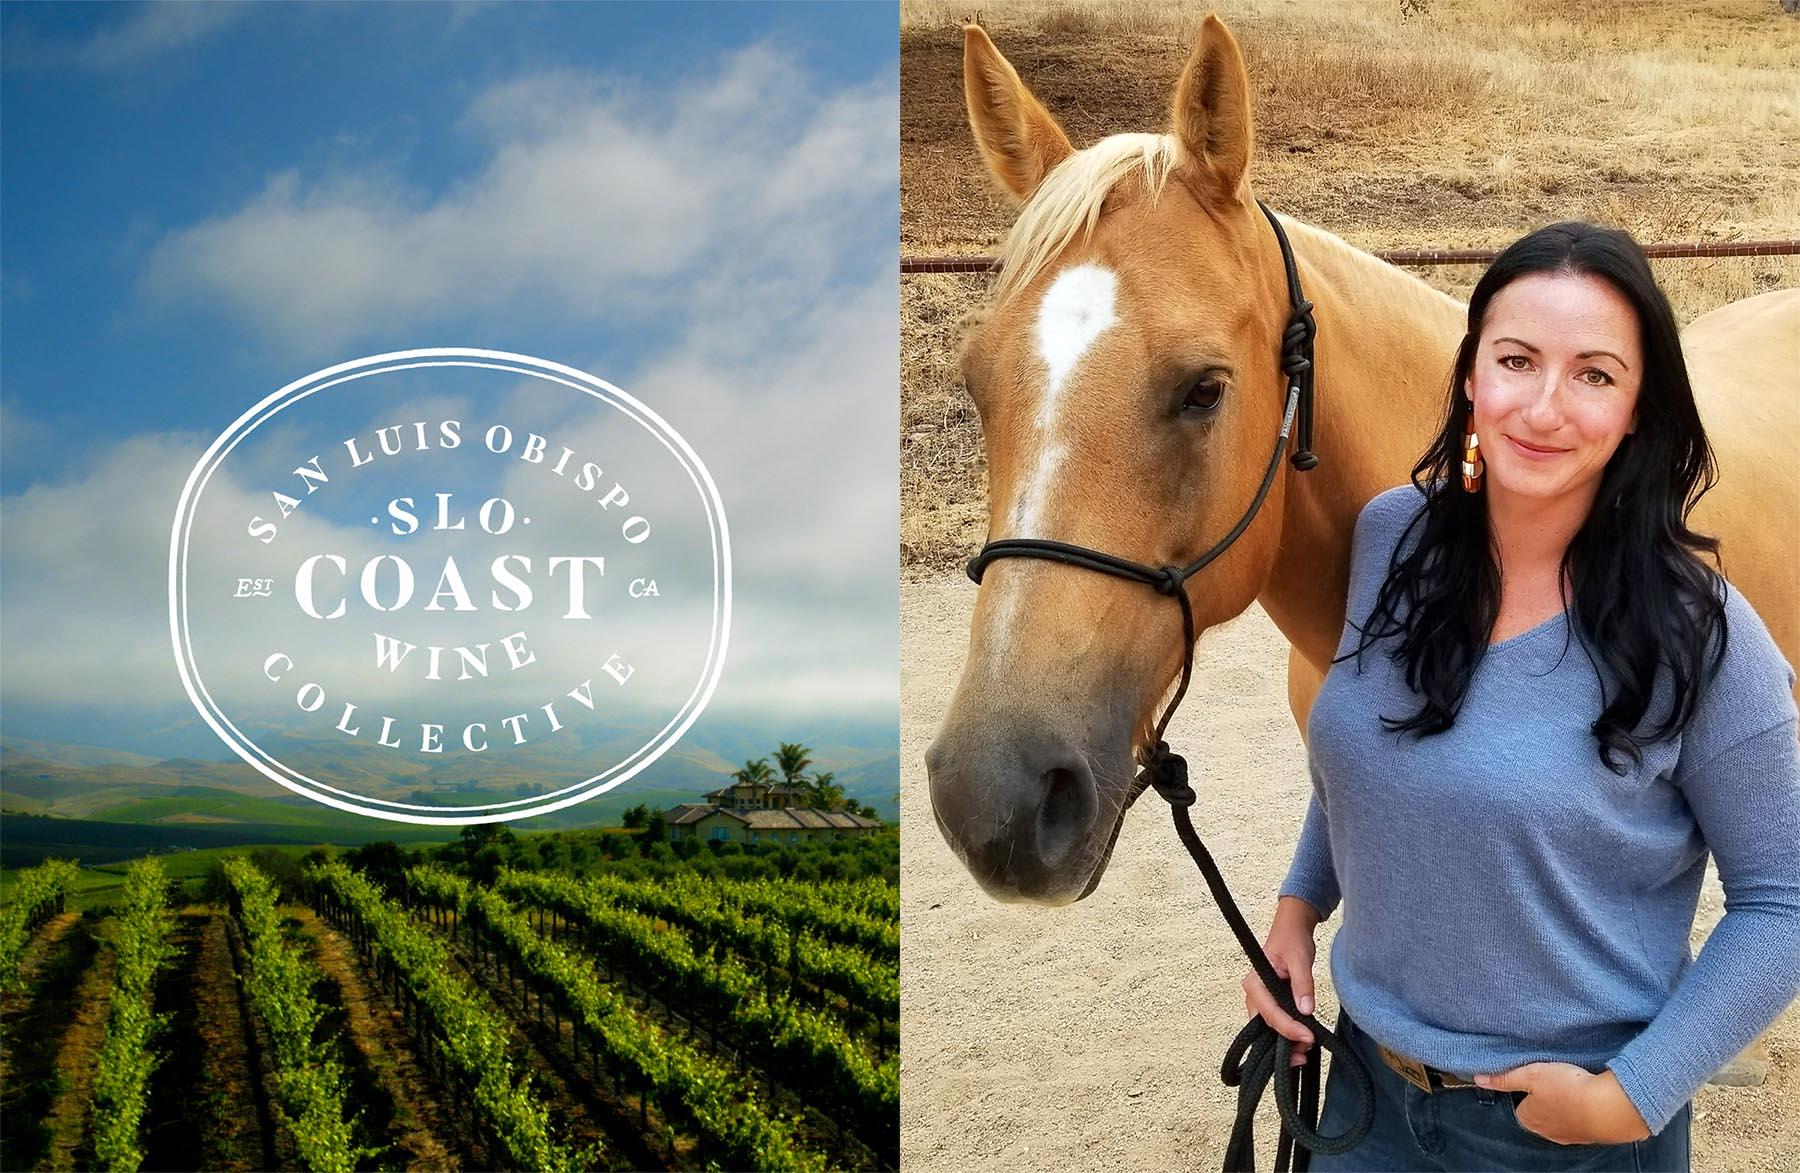 San Luis Obispo Coast Wine Collective Announces New Executive Director Kathleen Naughton